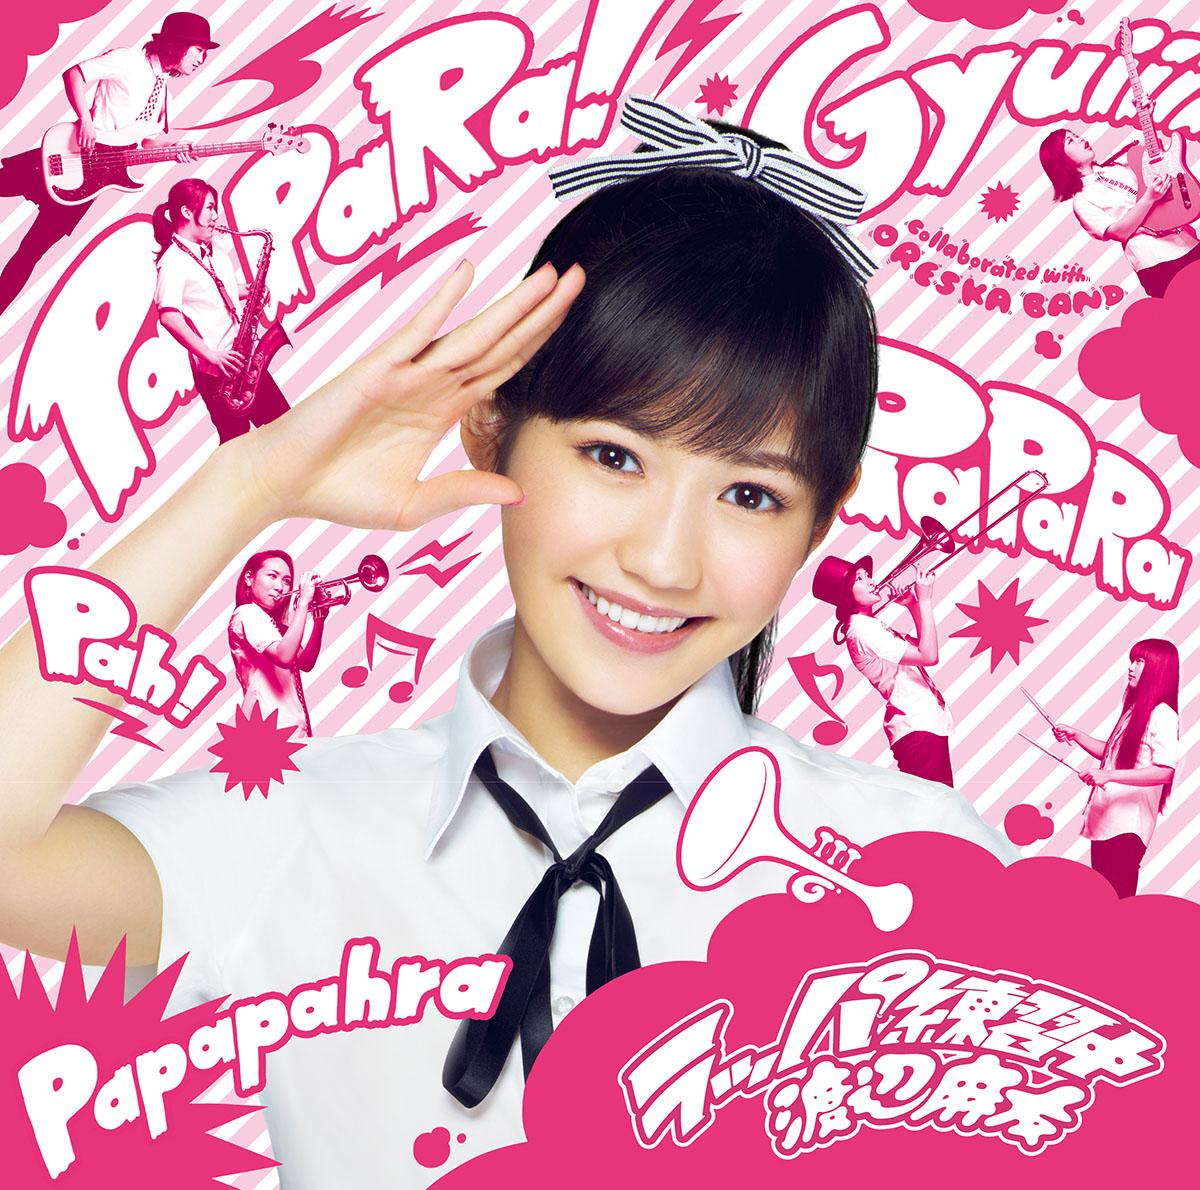 20171229.1319.5 Mayu Watanabe - Rappa Renshuchu (Type A) (FLAC) cover 2.jpg